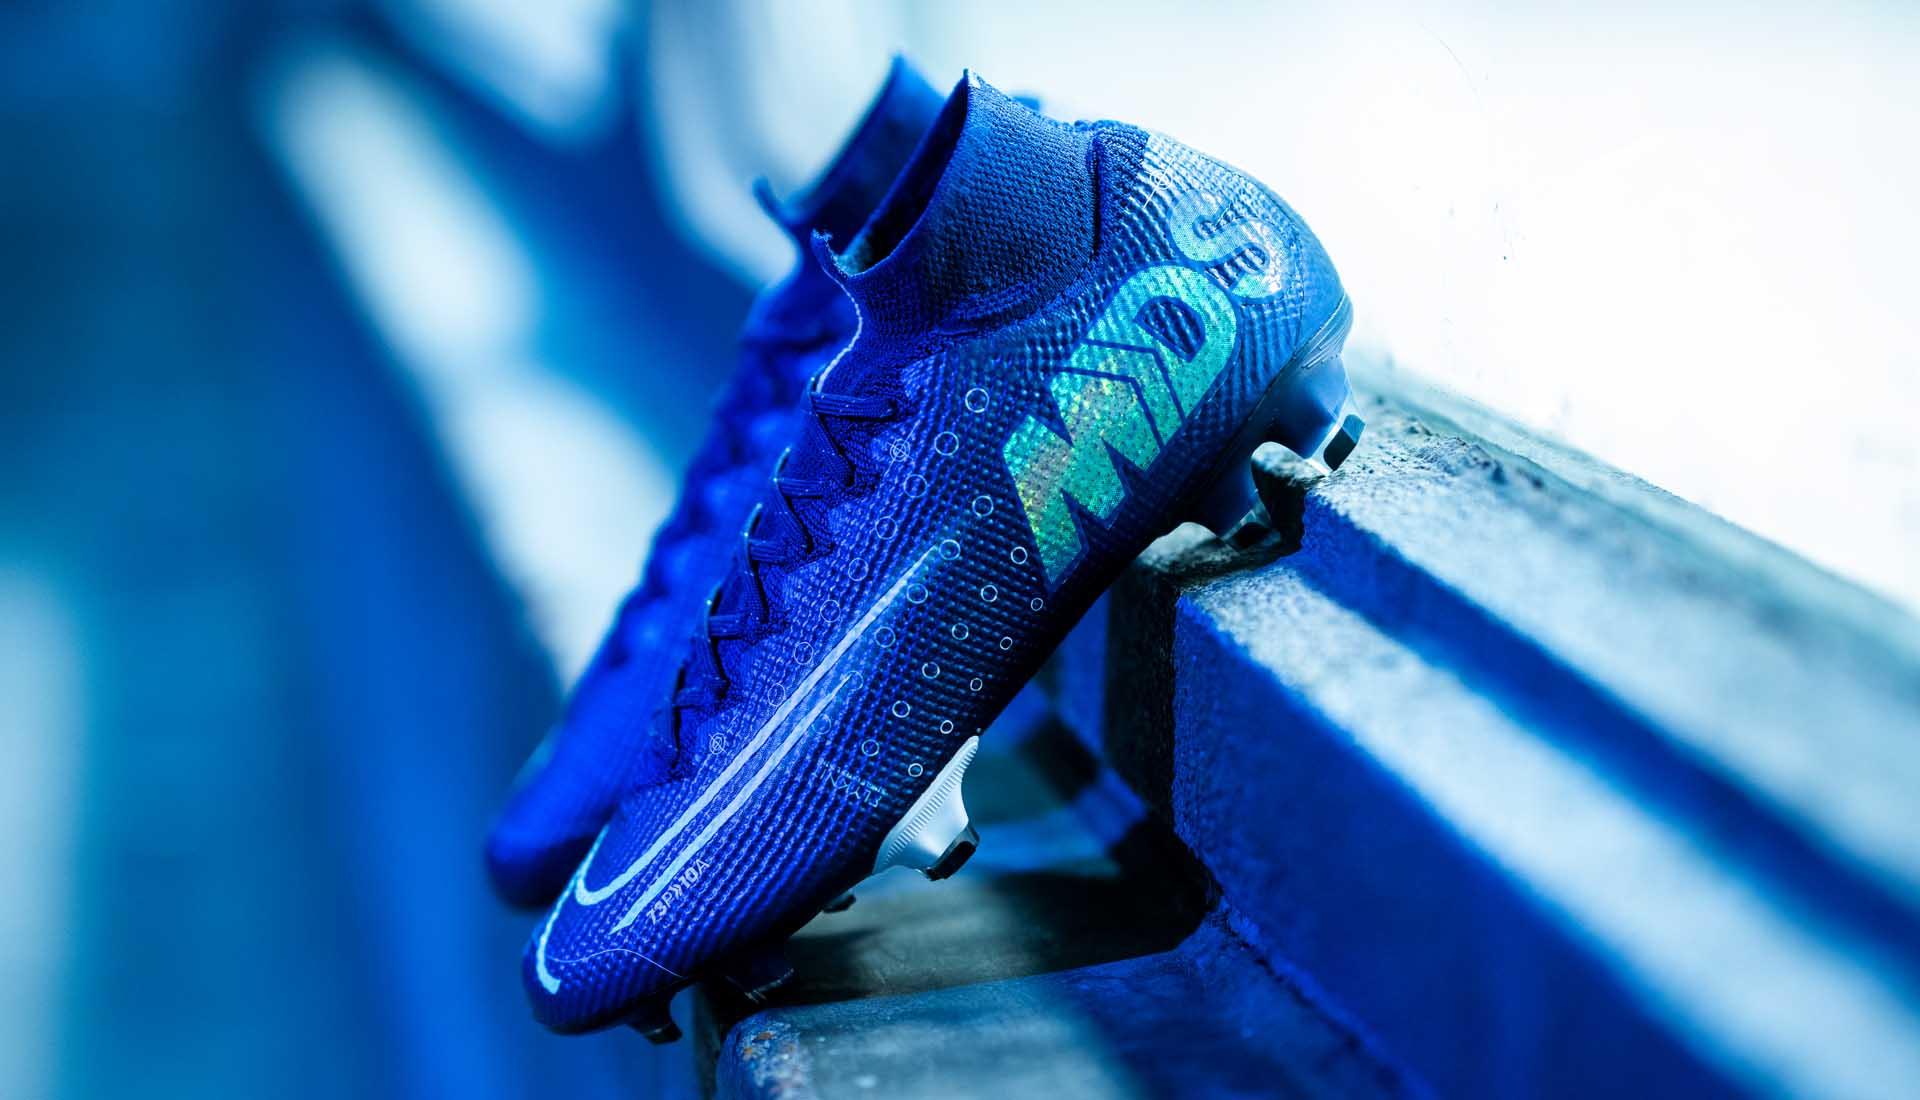 novato facil de manejar Diez  Nike Launch The Mercurial 'Dream Speed' Football Boots - SoccerBible